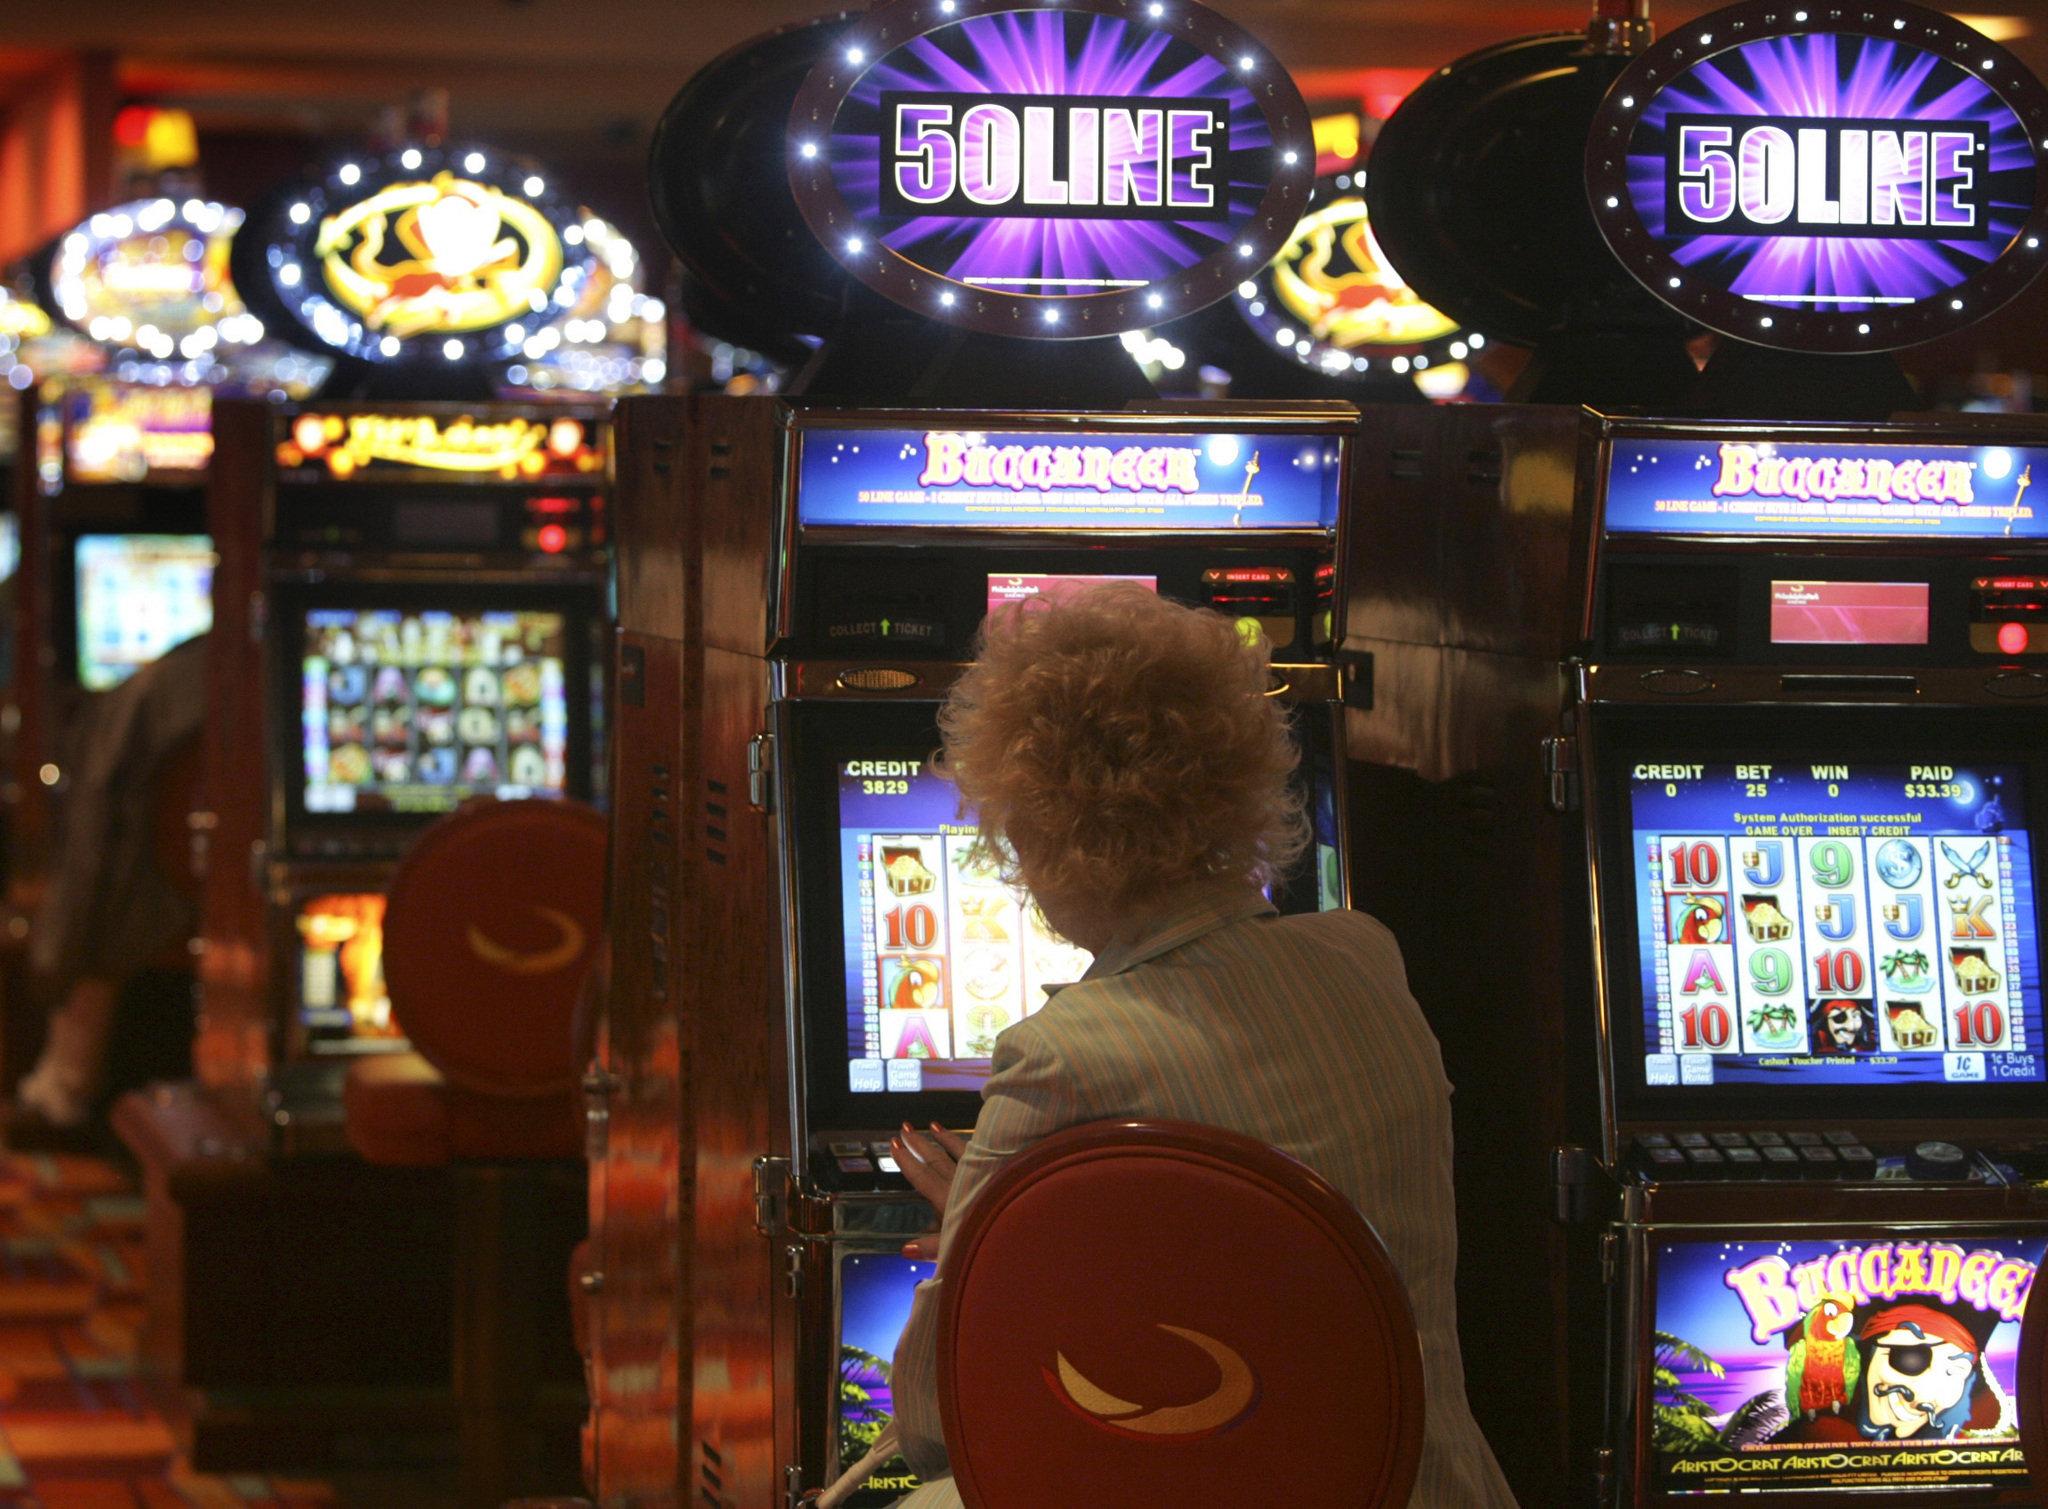 Woman try to win jackpot at slot machine